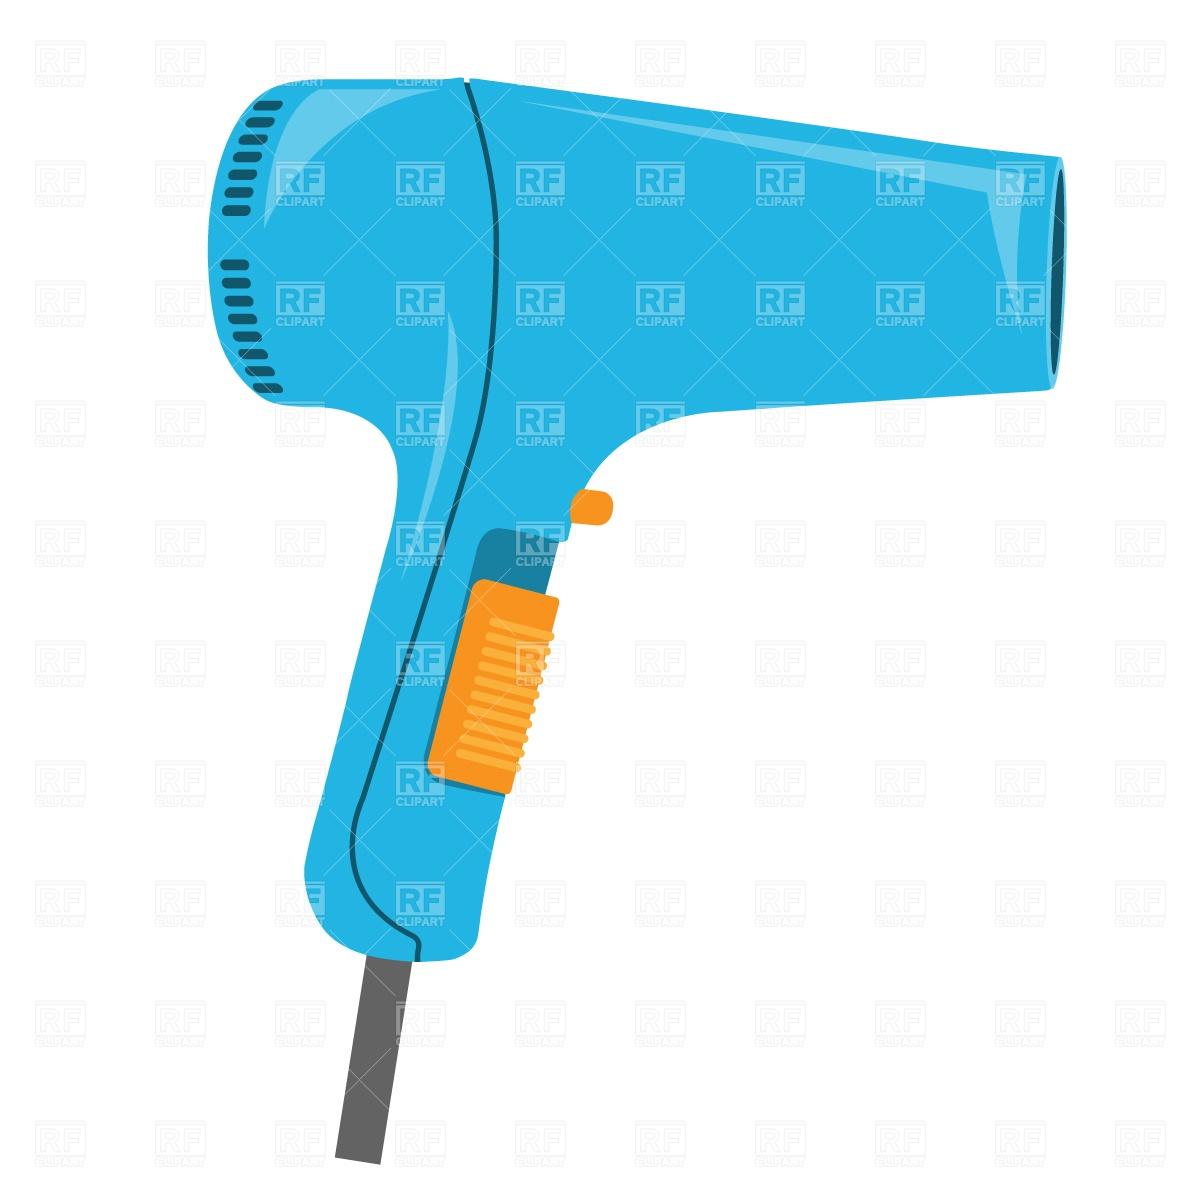 Hair Dryer Clip Art ~ Hair dryer clipart suggest